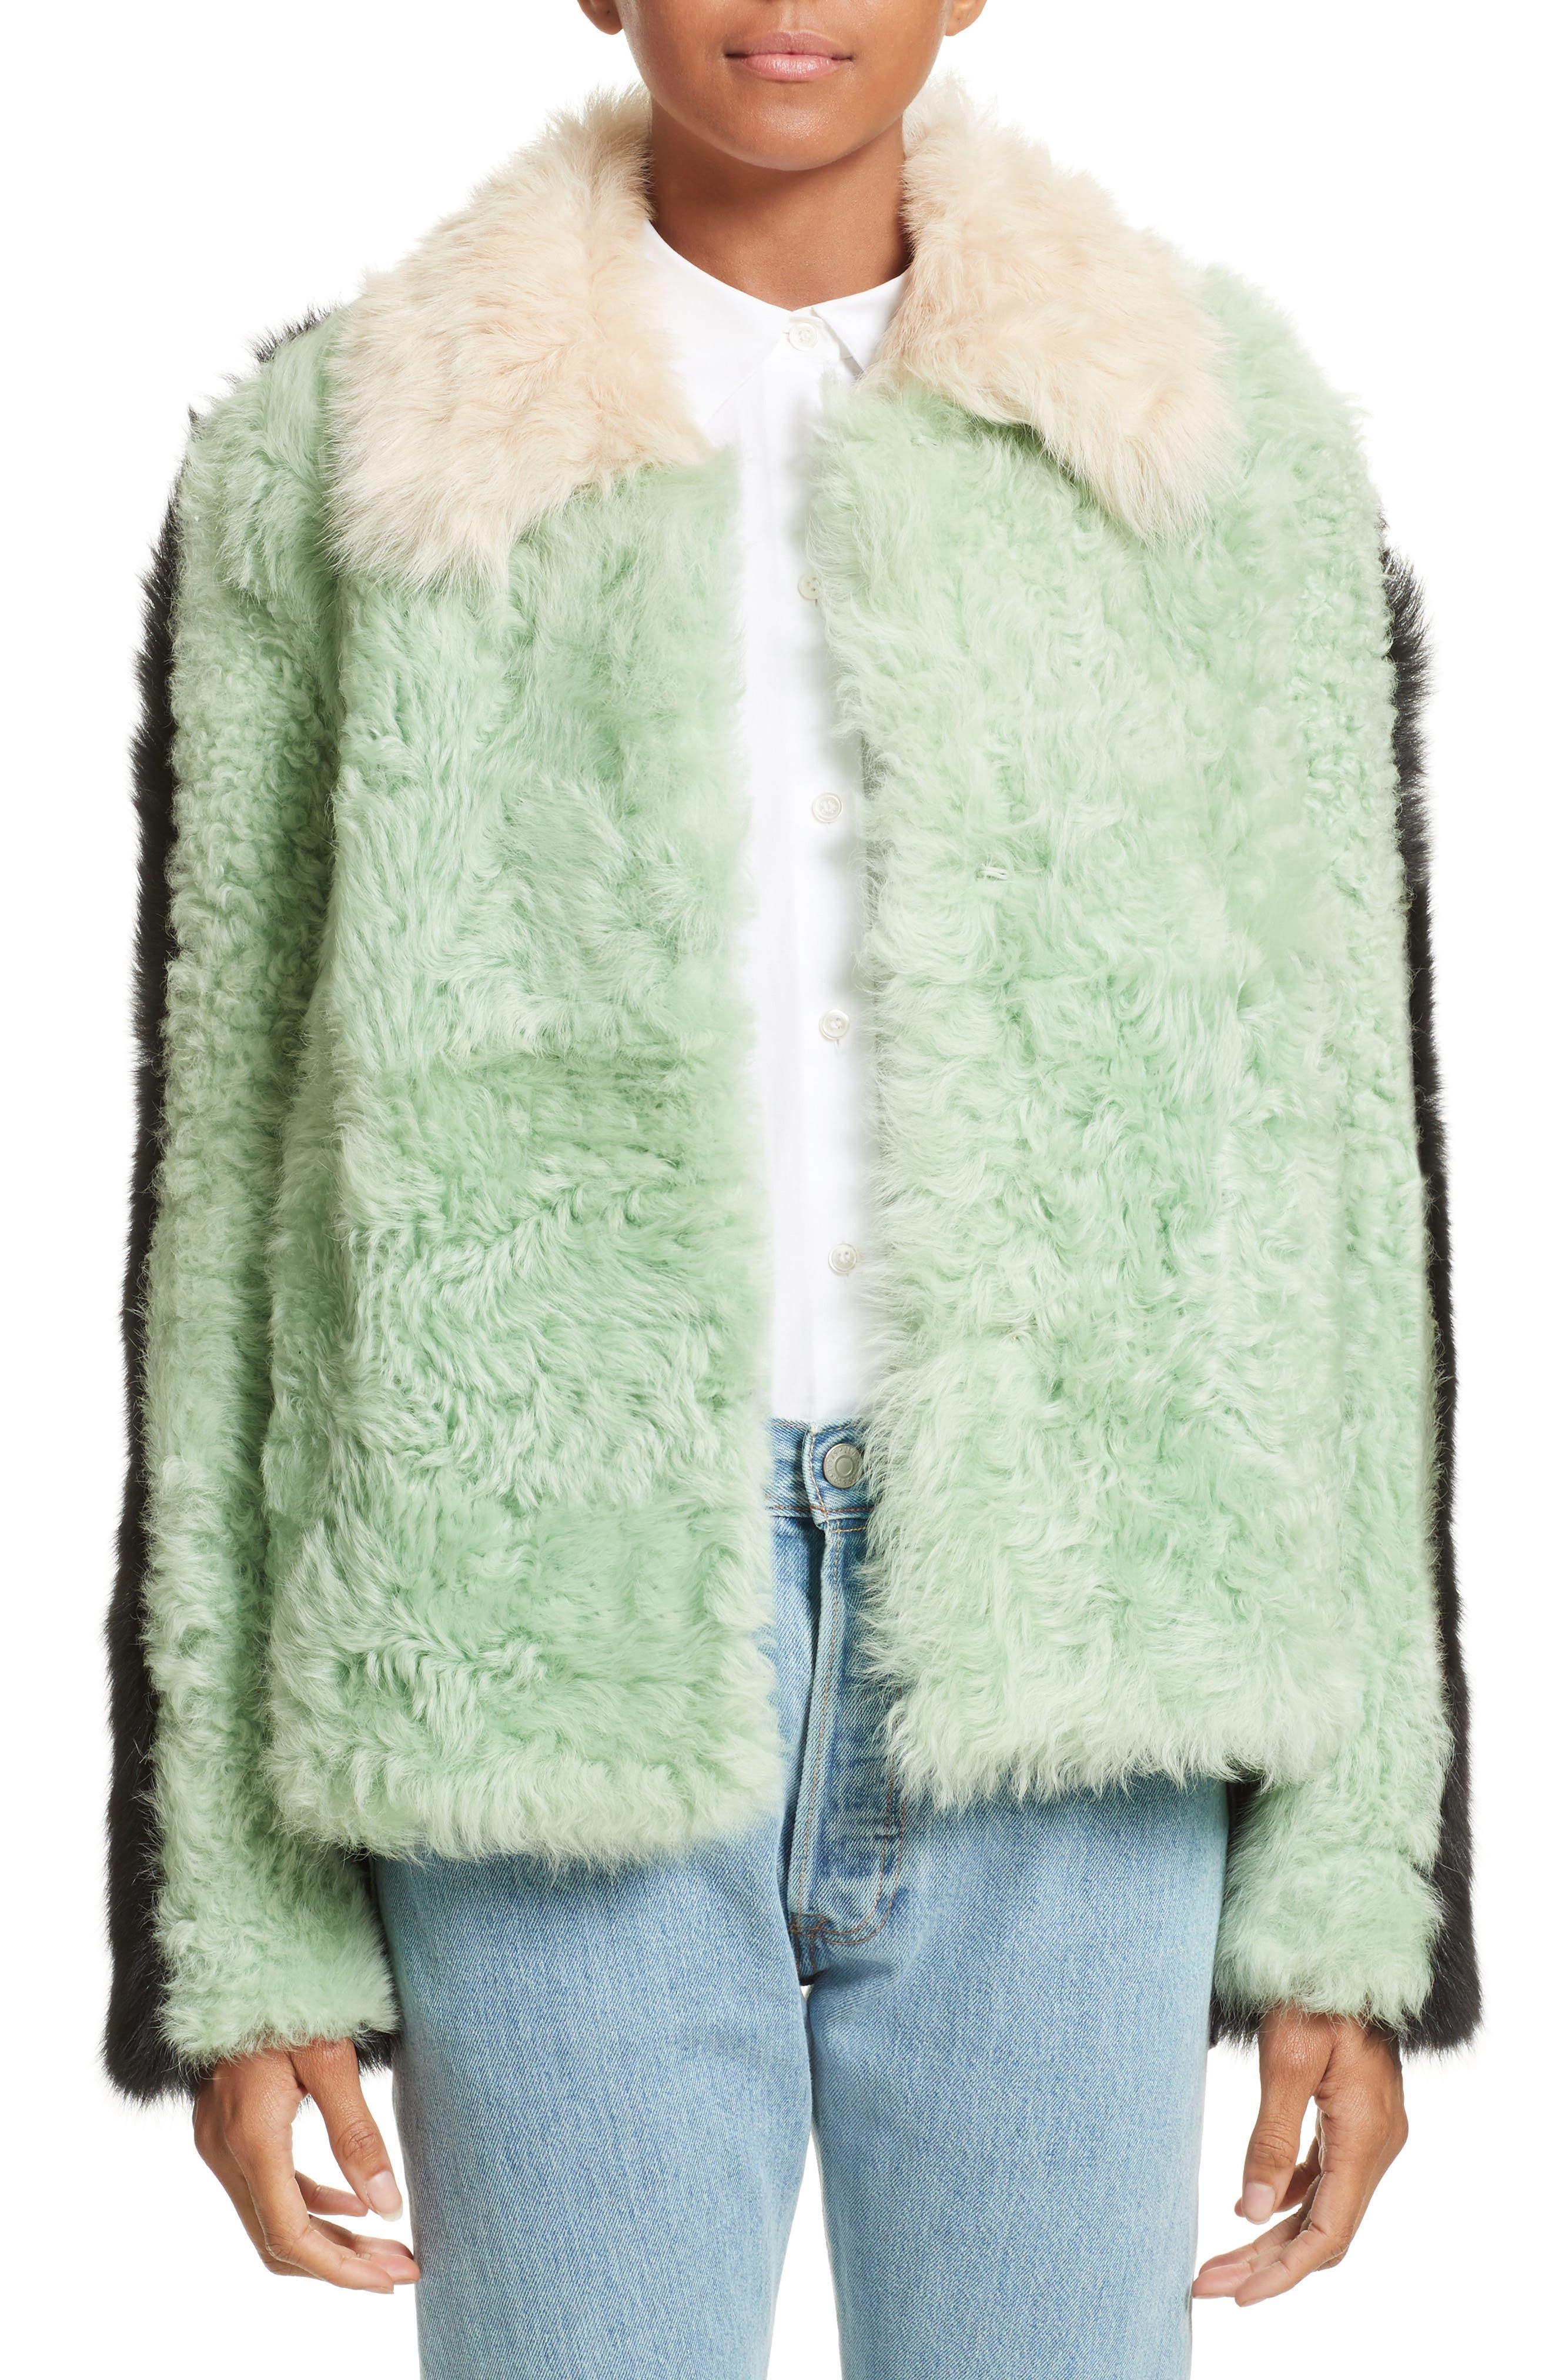 Cashew Genuine Shearling Coat,                         Main,                         color, Glow In The Dark